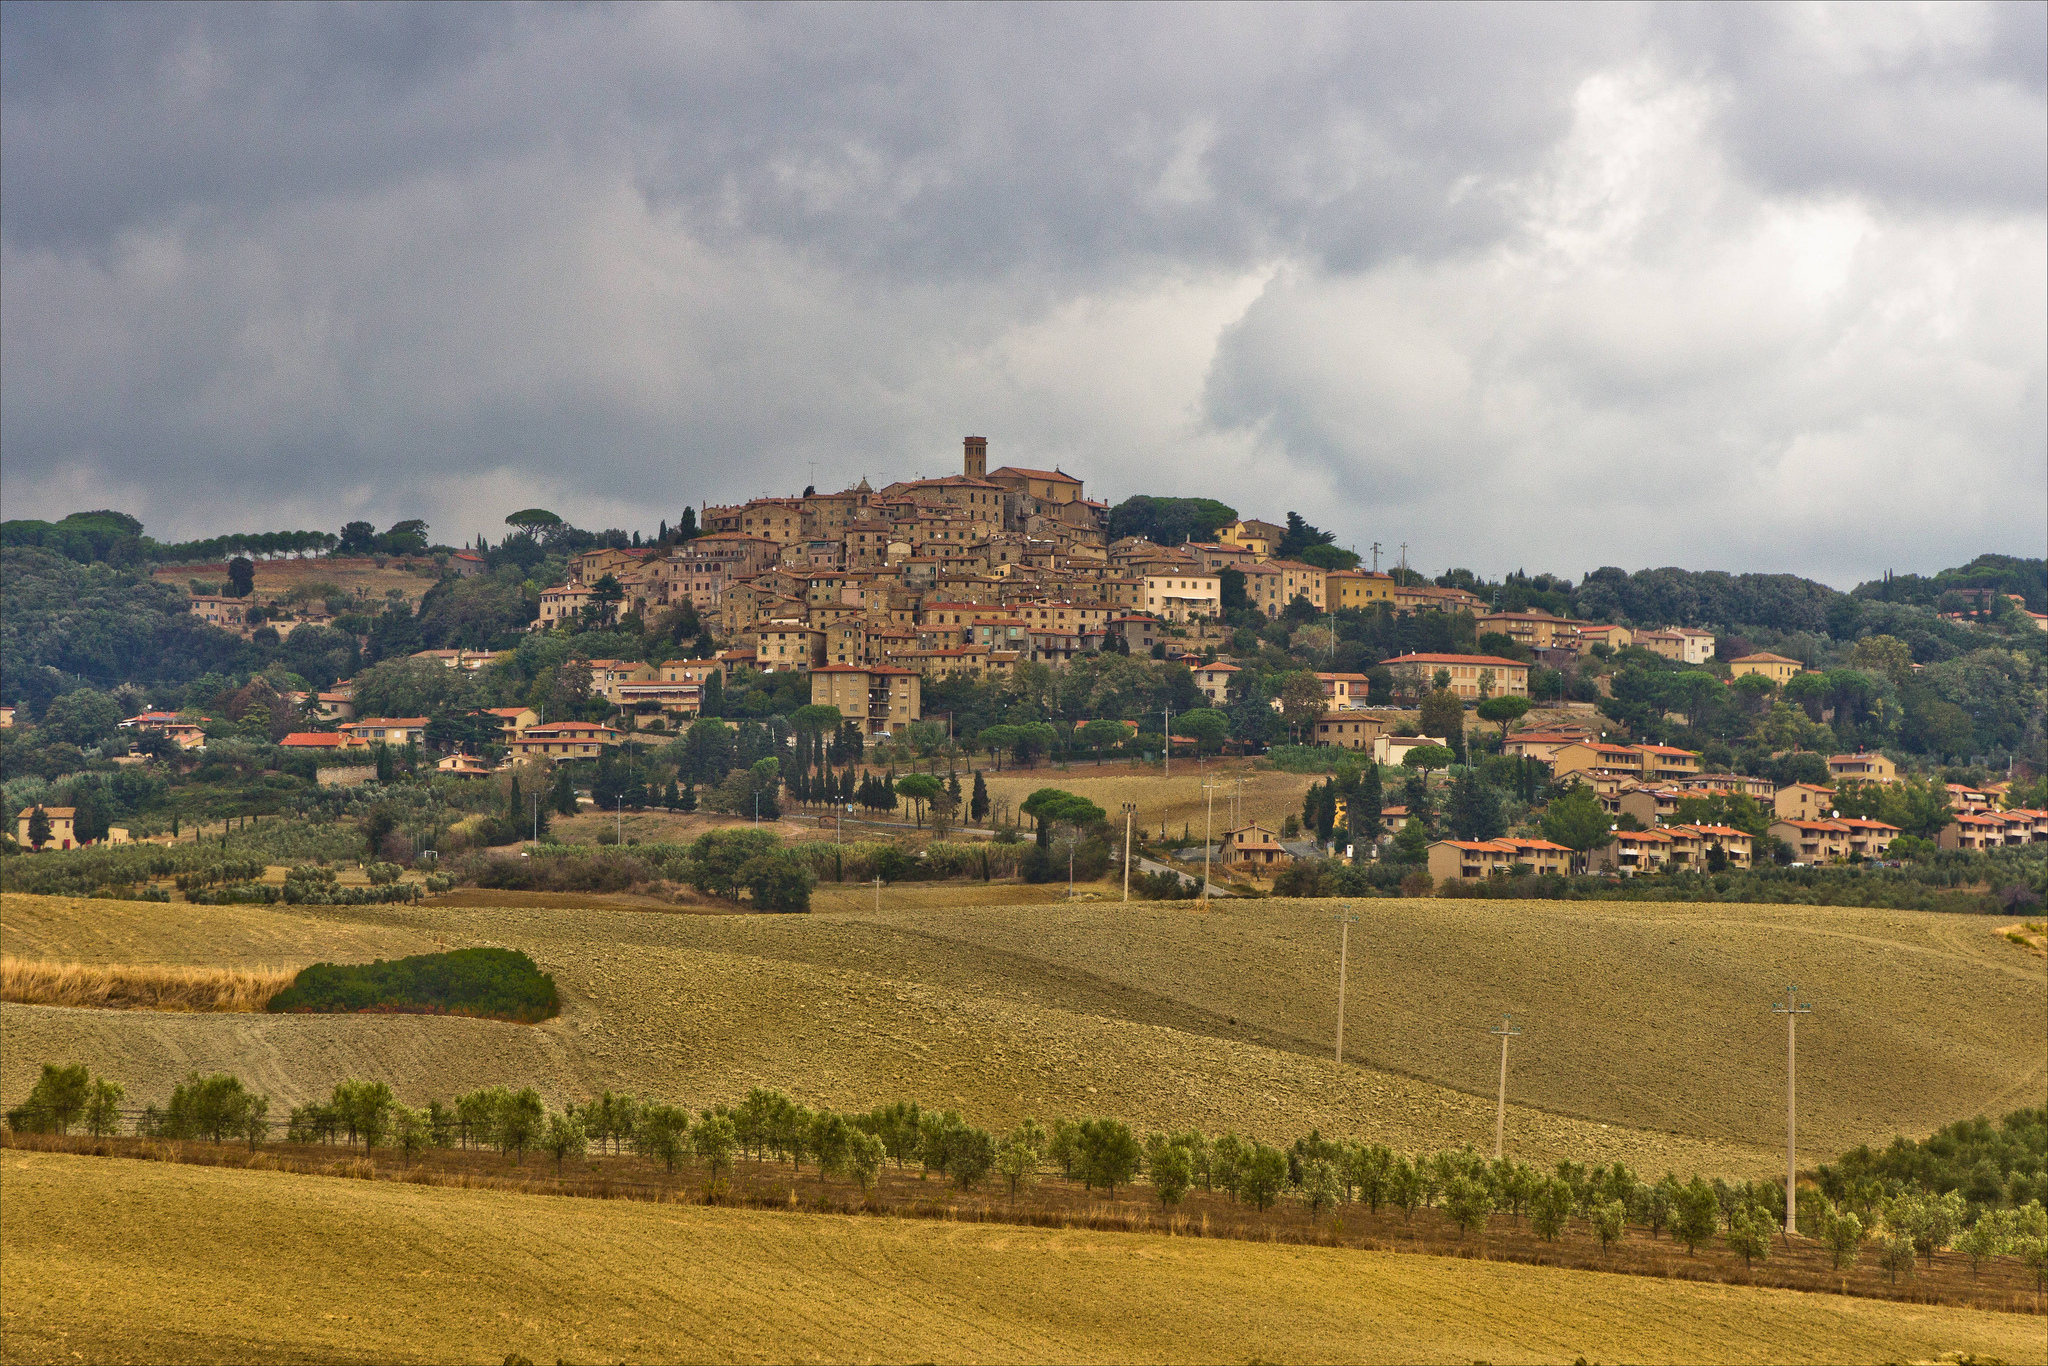 Casale marittimo un minuscolo borgo in toscana - Casale in toscana ...